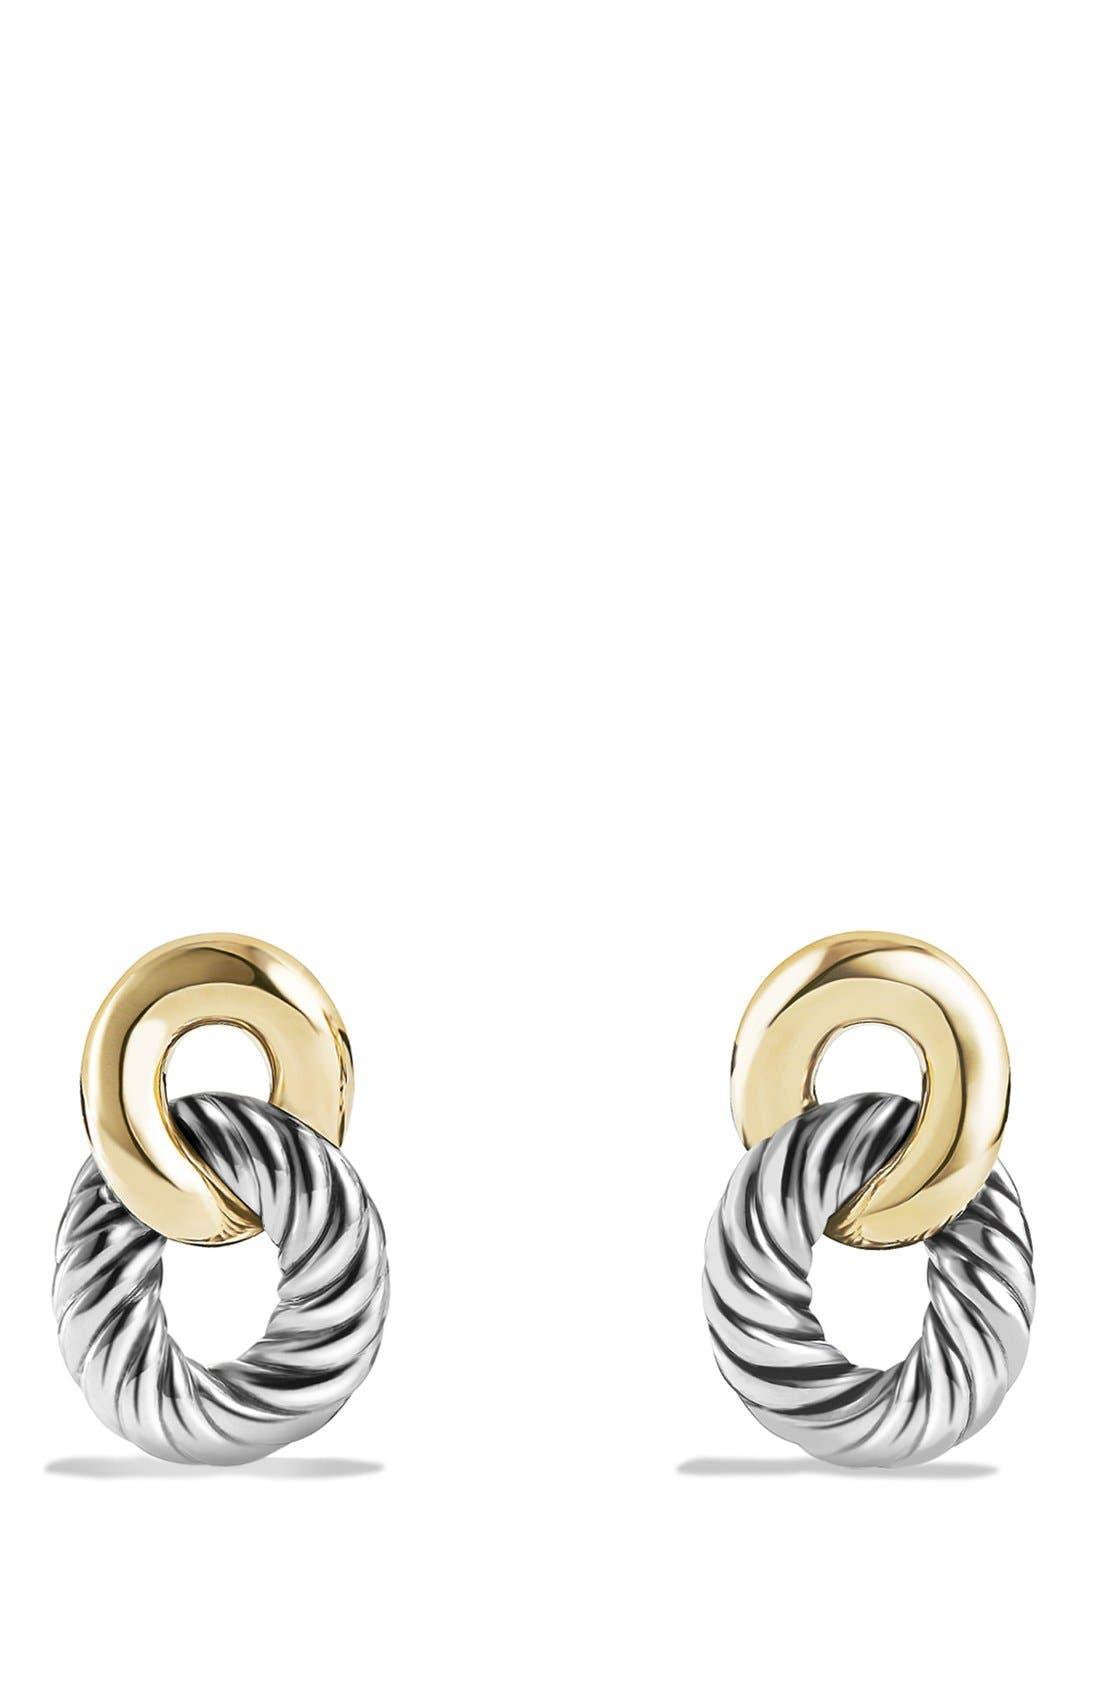 Main Image - David Yurman'Belmont' Curb Link Drop Earrings with 18K Gold